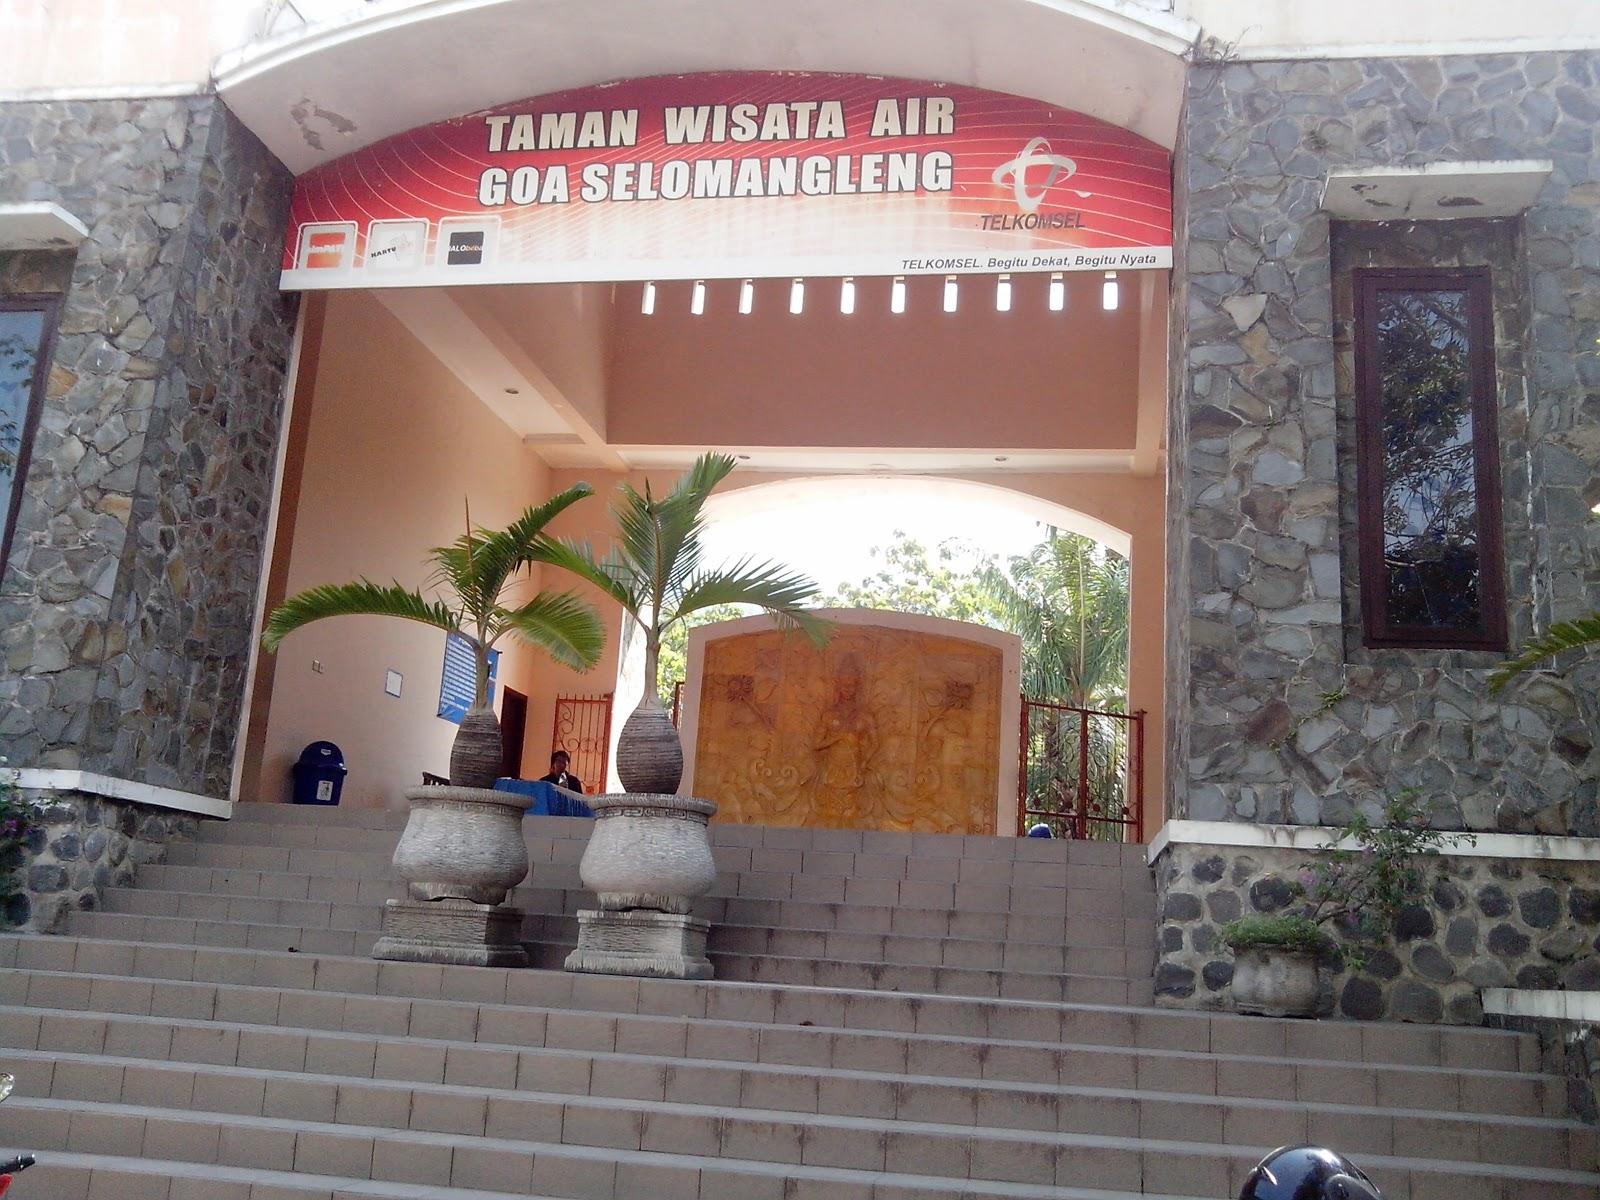 Taman Wisata Air Goa Selo Mangleng